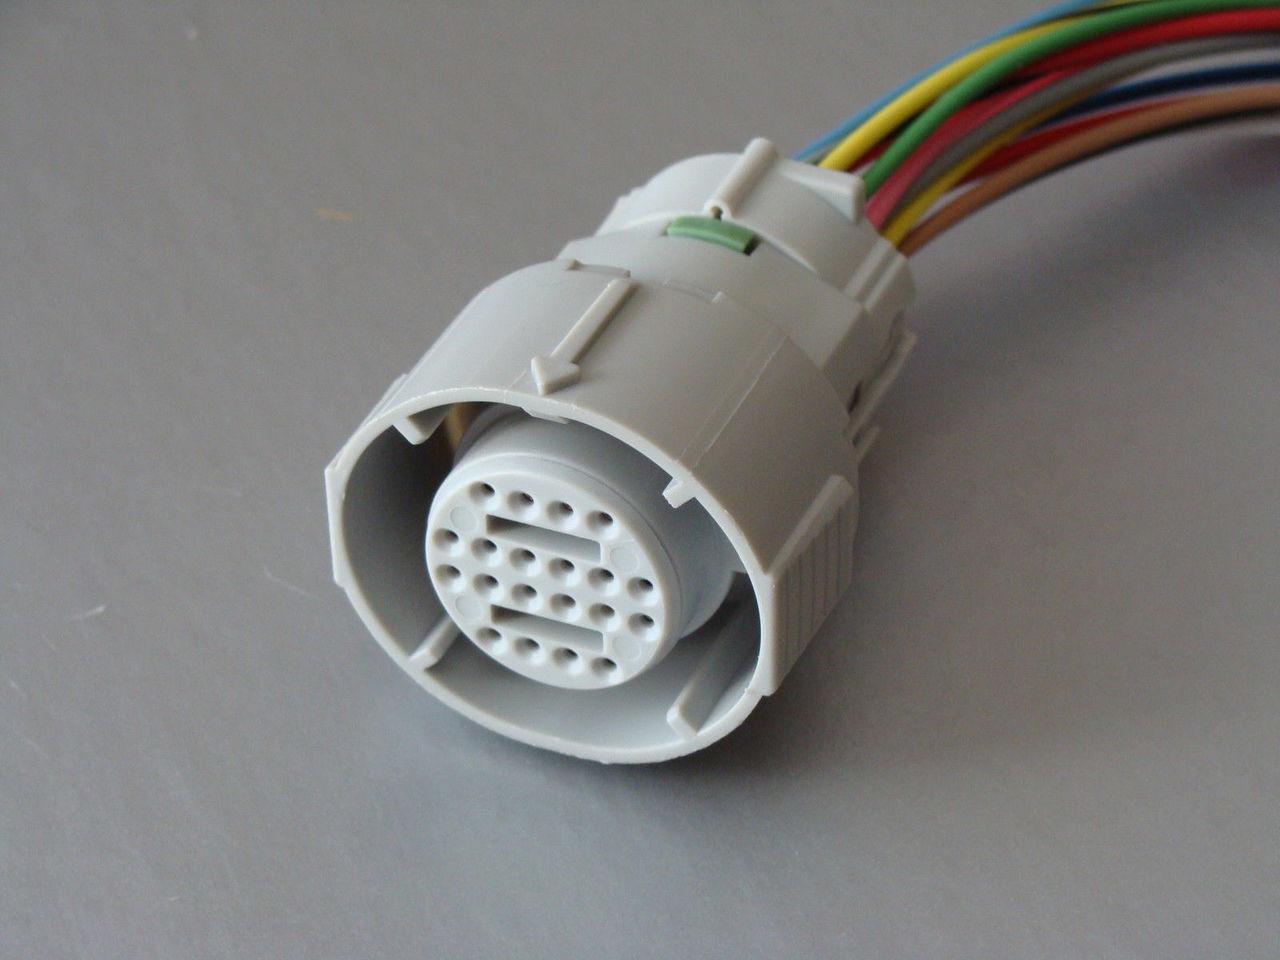 Lt1 4l60e Wiring Harness Diagram Data Ebay 94 02 Ls1 Automatic Transmission Connector Hawks 1996 Silverado